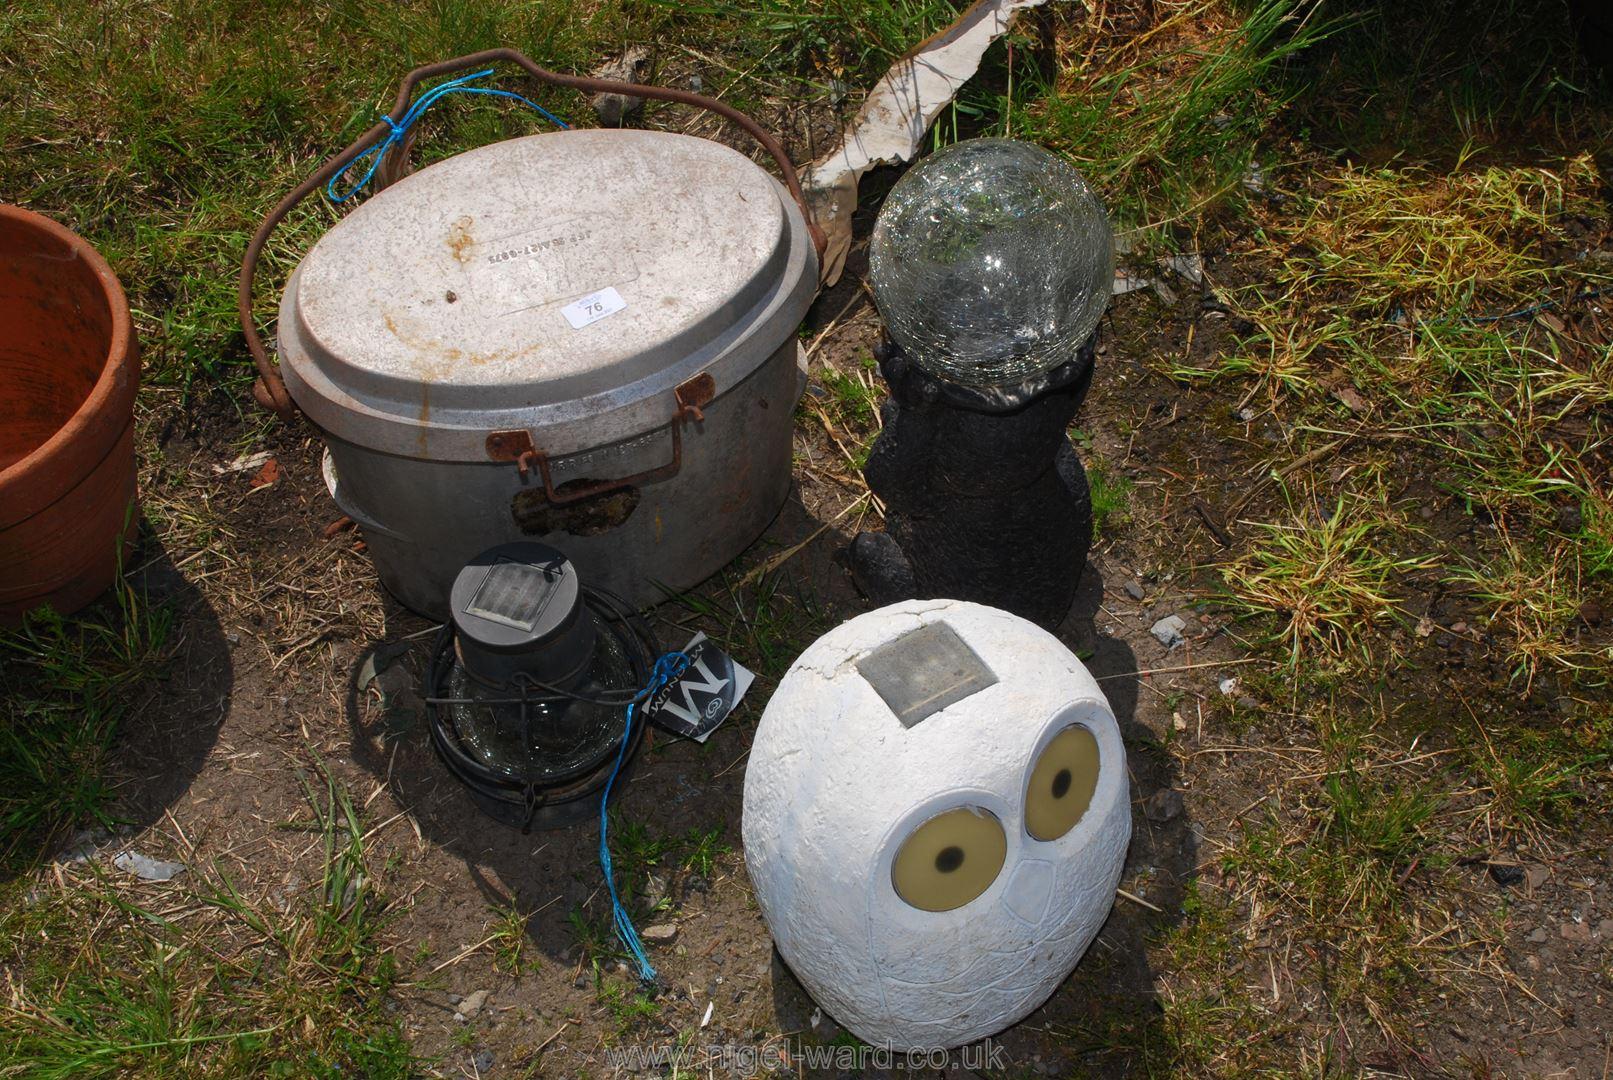 A lidded swing pot and three garden solar lights.